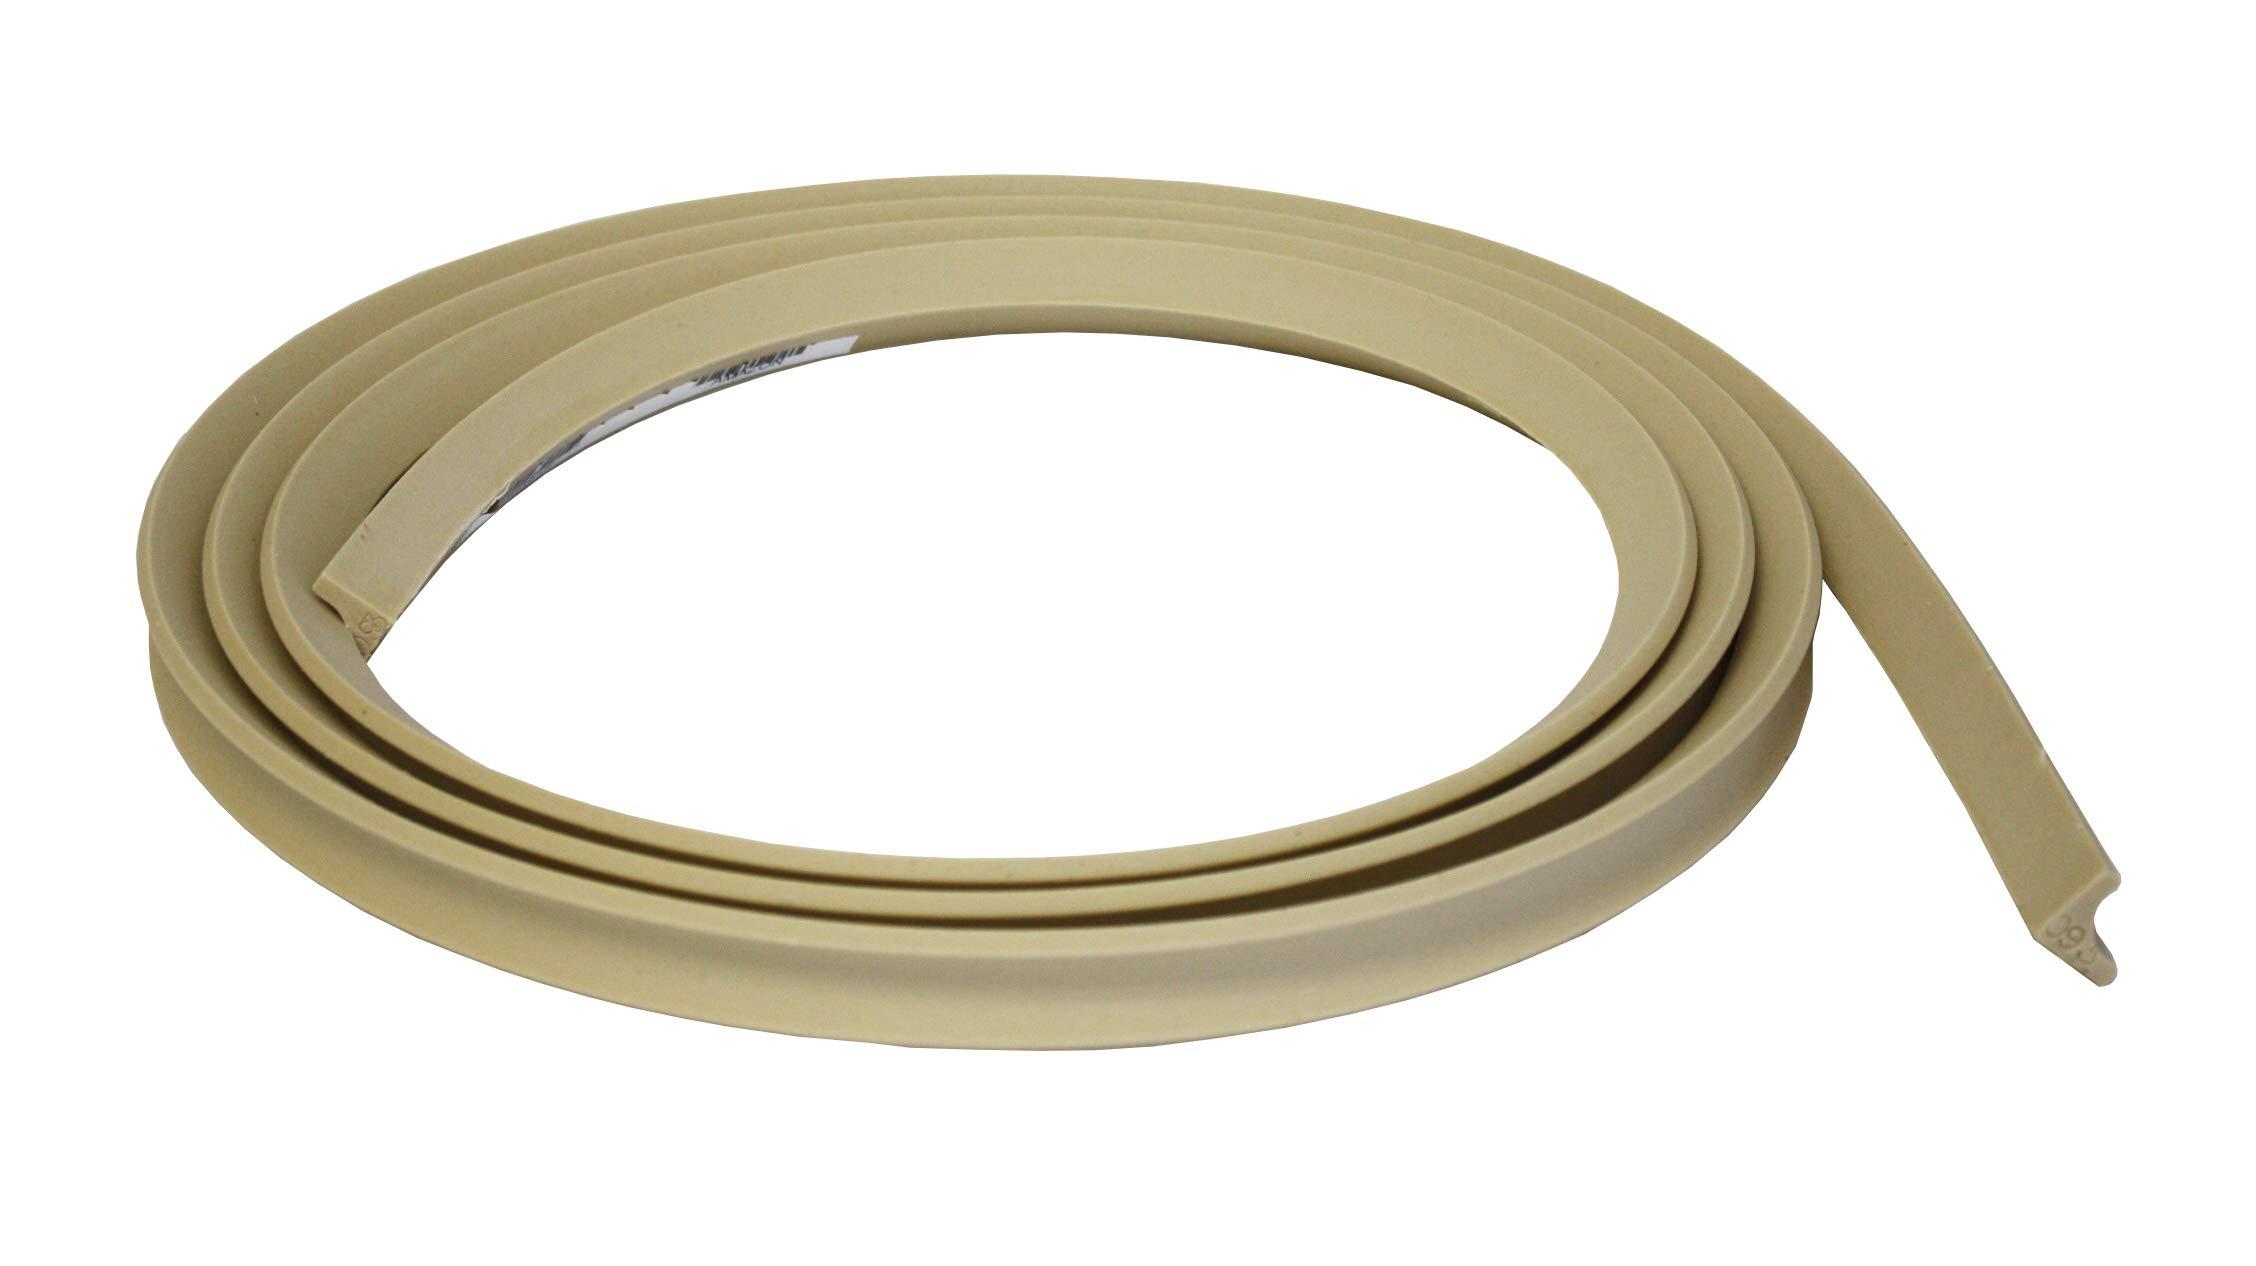 Flexible Moulding - Flexible Cove Moulding - WM093-3/4'' X 3/4'' - 12' Length - Flexible Trim by Duraflex by Resinart